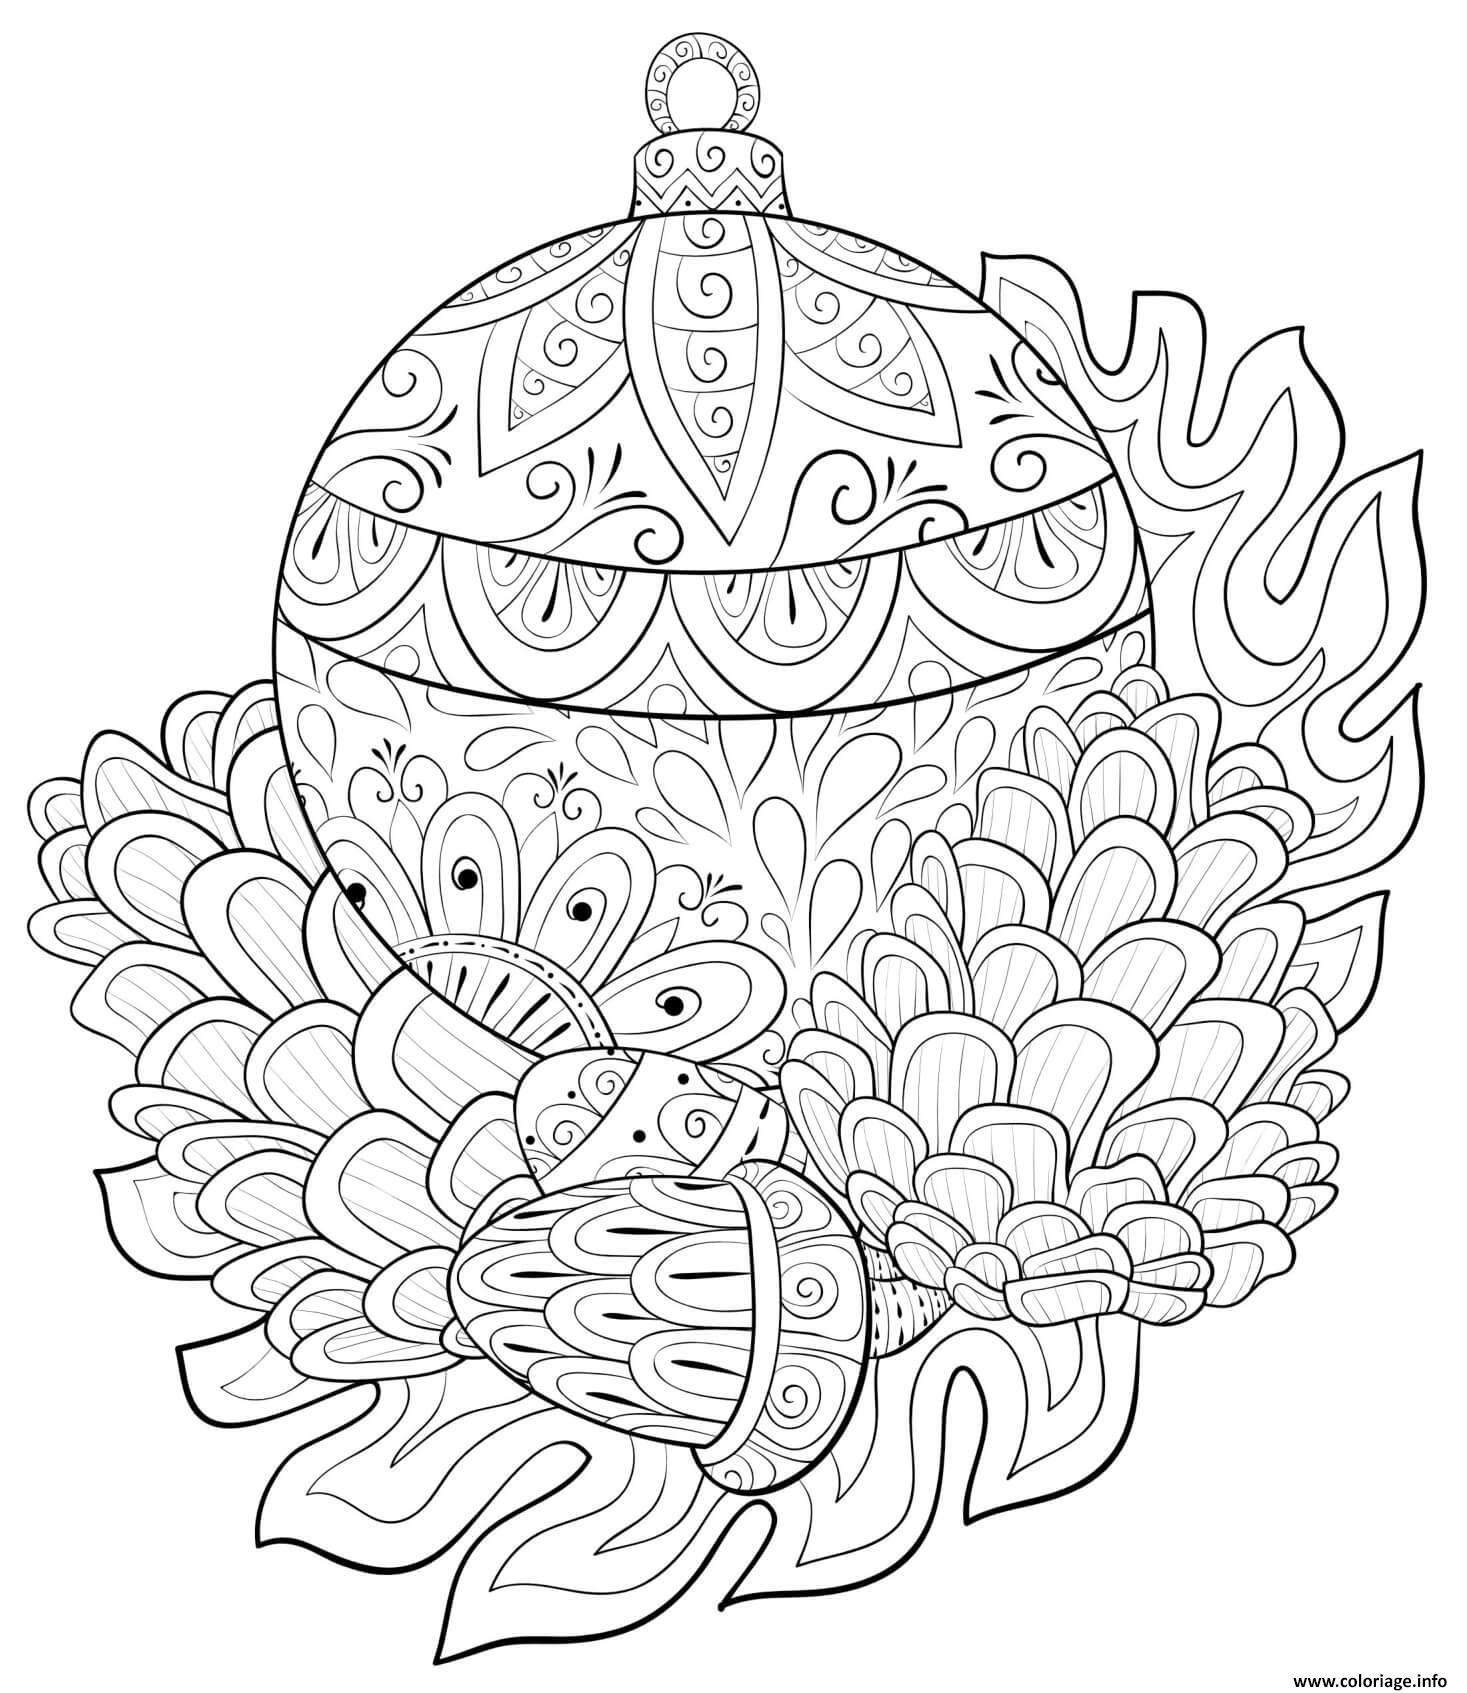 Coloriage decorations boule de noel mandala anti stress ...